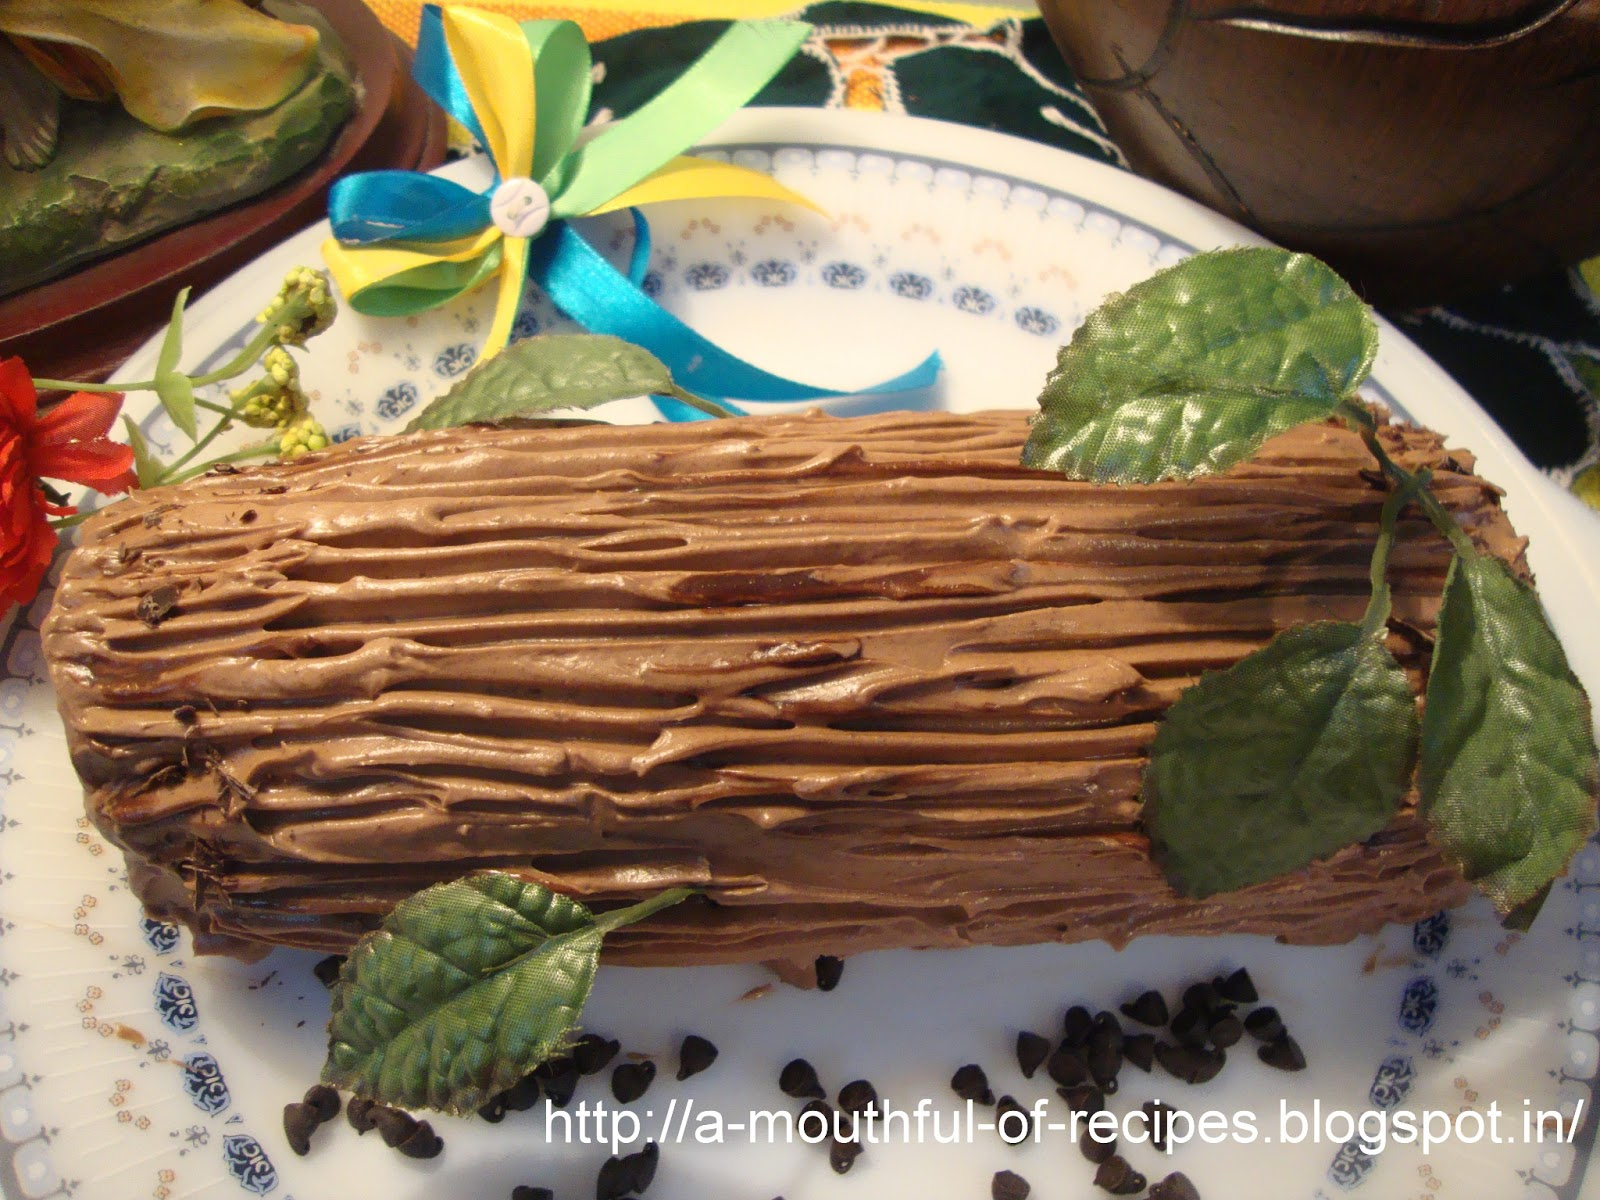 A Mouthful Of Recipes: Chocolate Yule Log (Bûche de Noel)